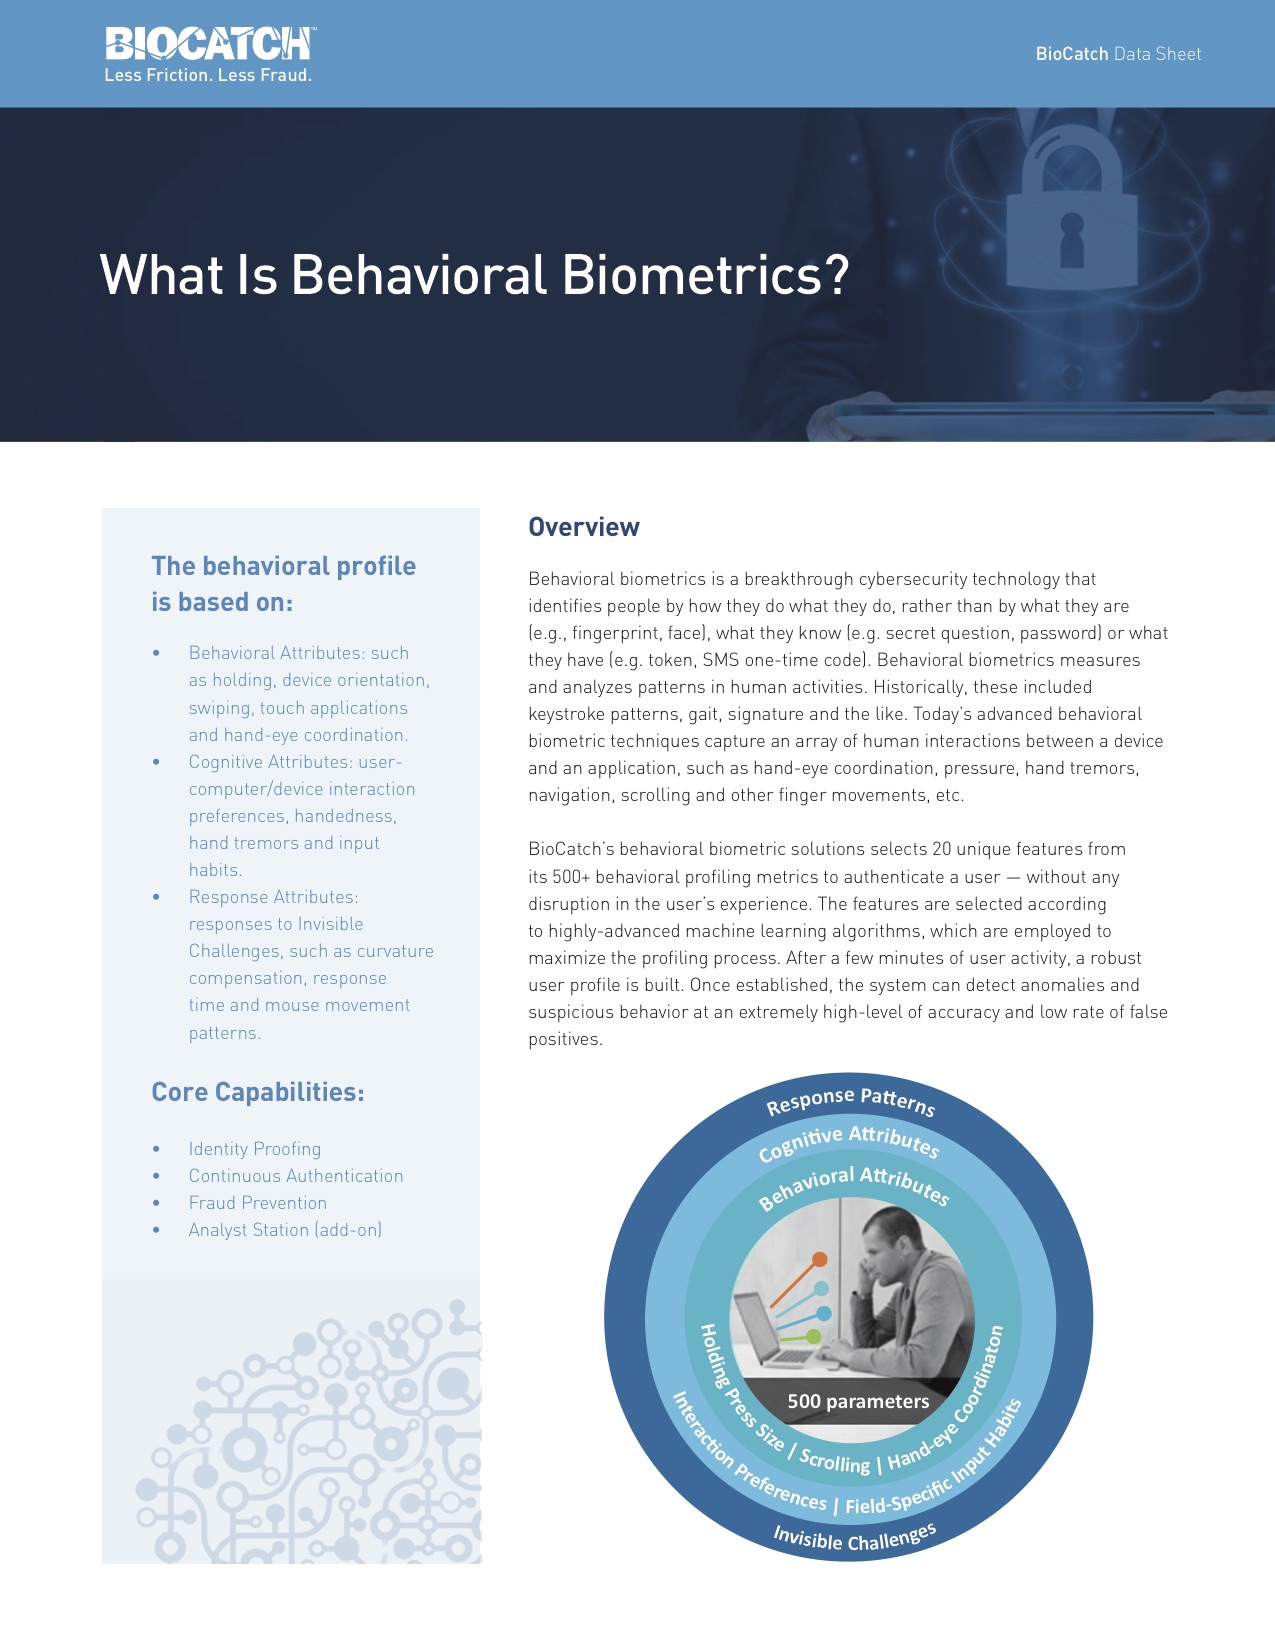 What is Behavioral Biometrics